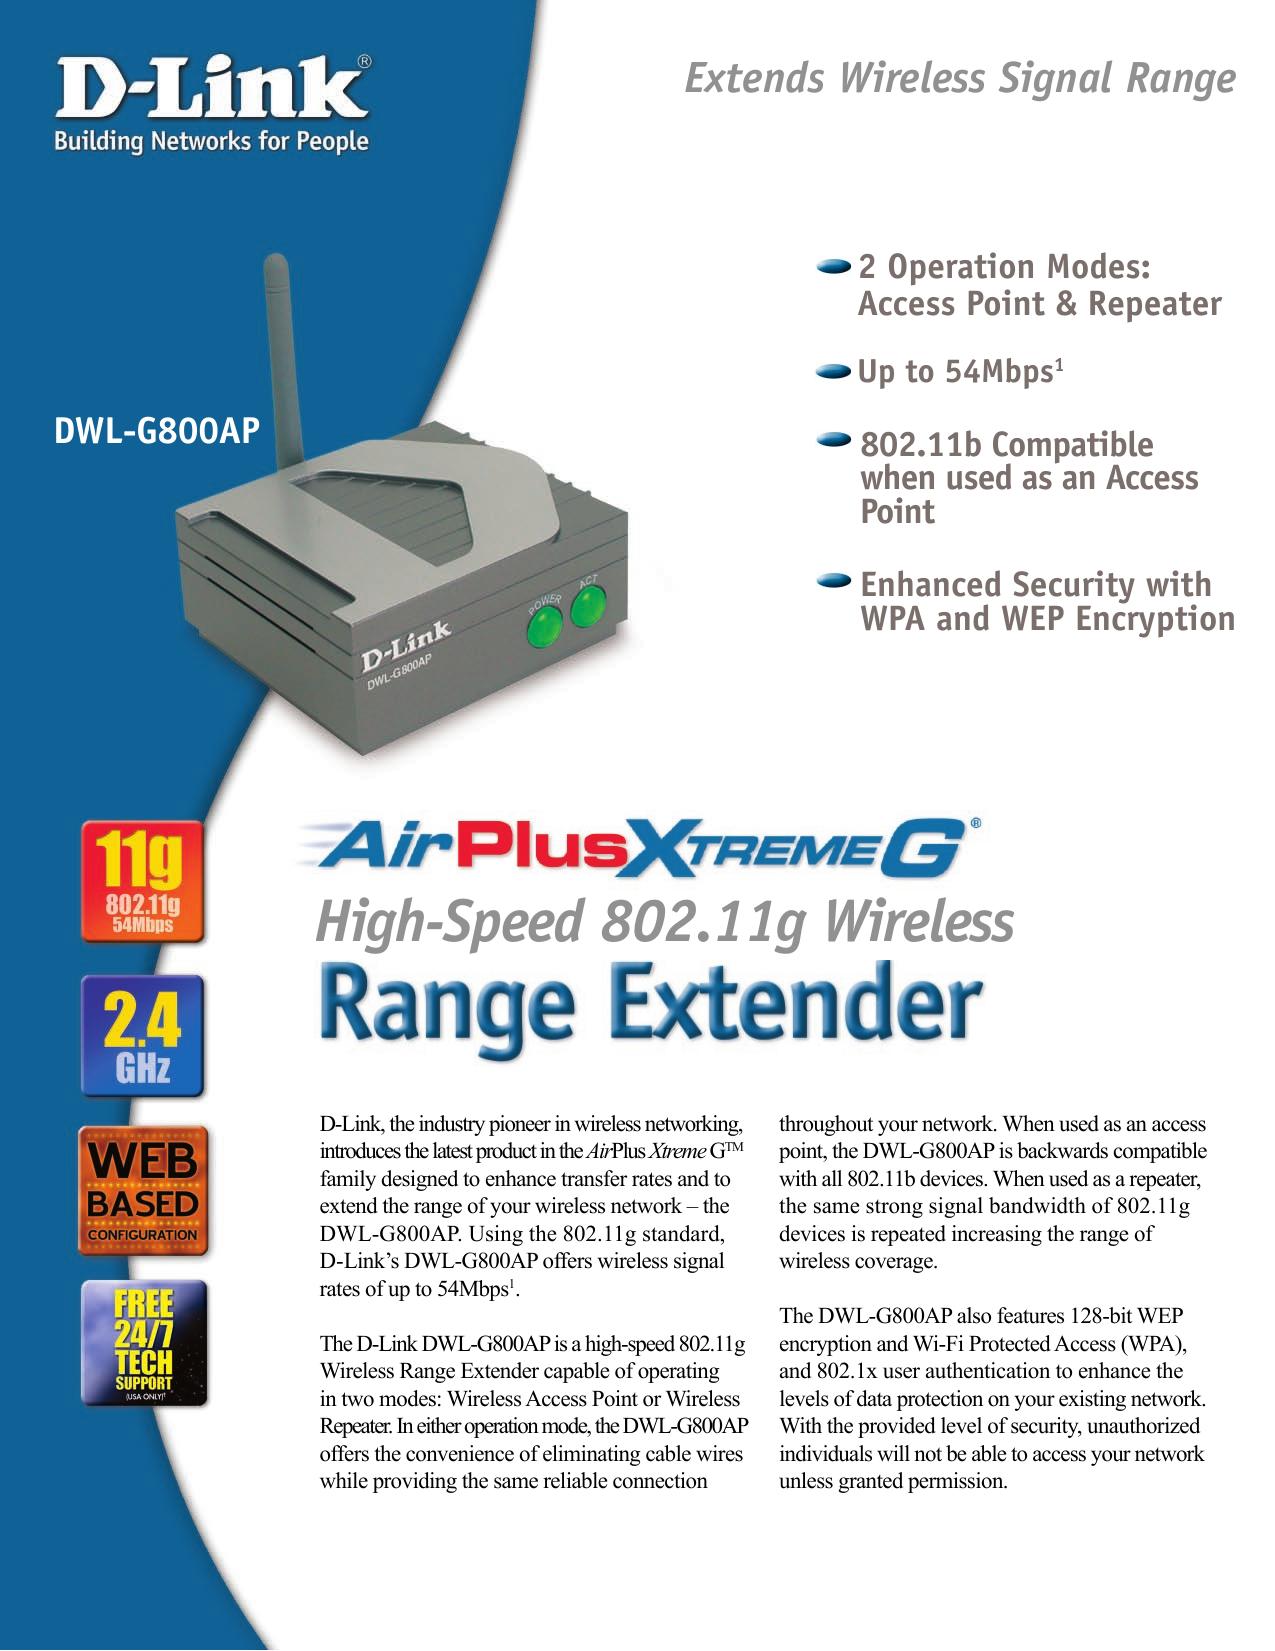 D-LINK DWL-G800AP DESCARGAR CONTROLADOR